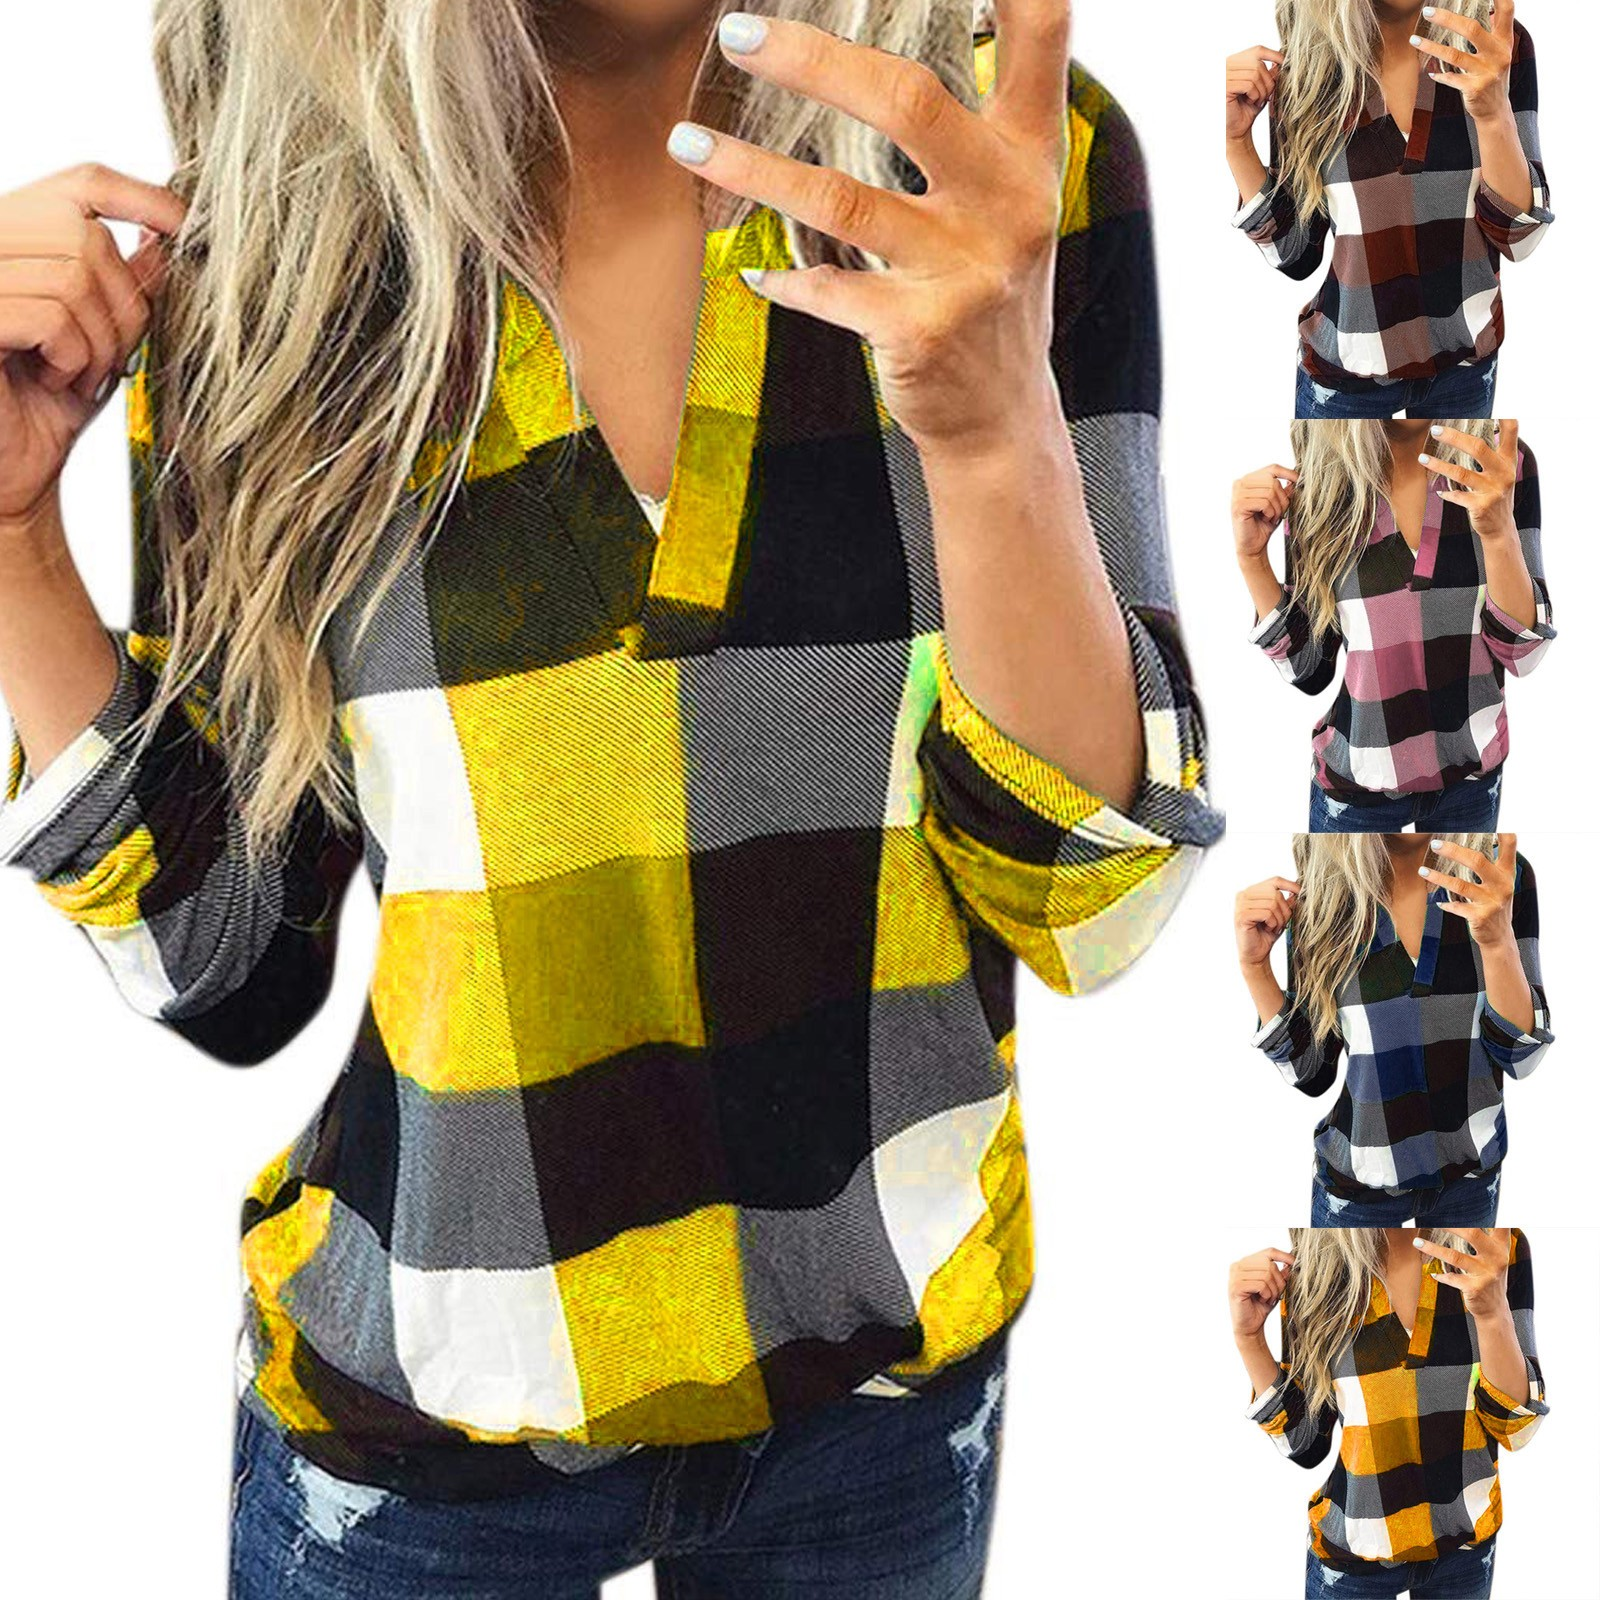 Laamei Mode Marke Kariertes Hemd Frauen Herbst 2020 Winter Warm Up Bluse Femme V ausschnitt Lose Blusa Gitter Druck Stil tops|Blusen & Hemden|   -